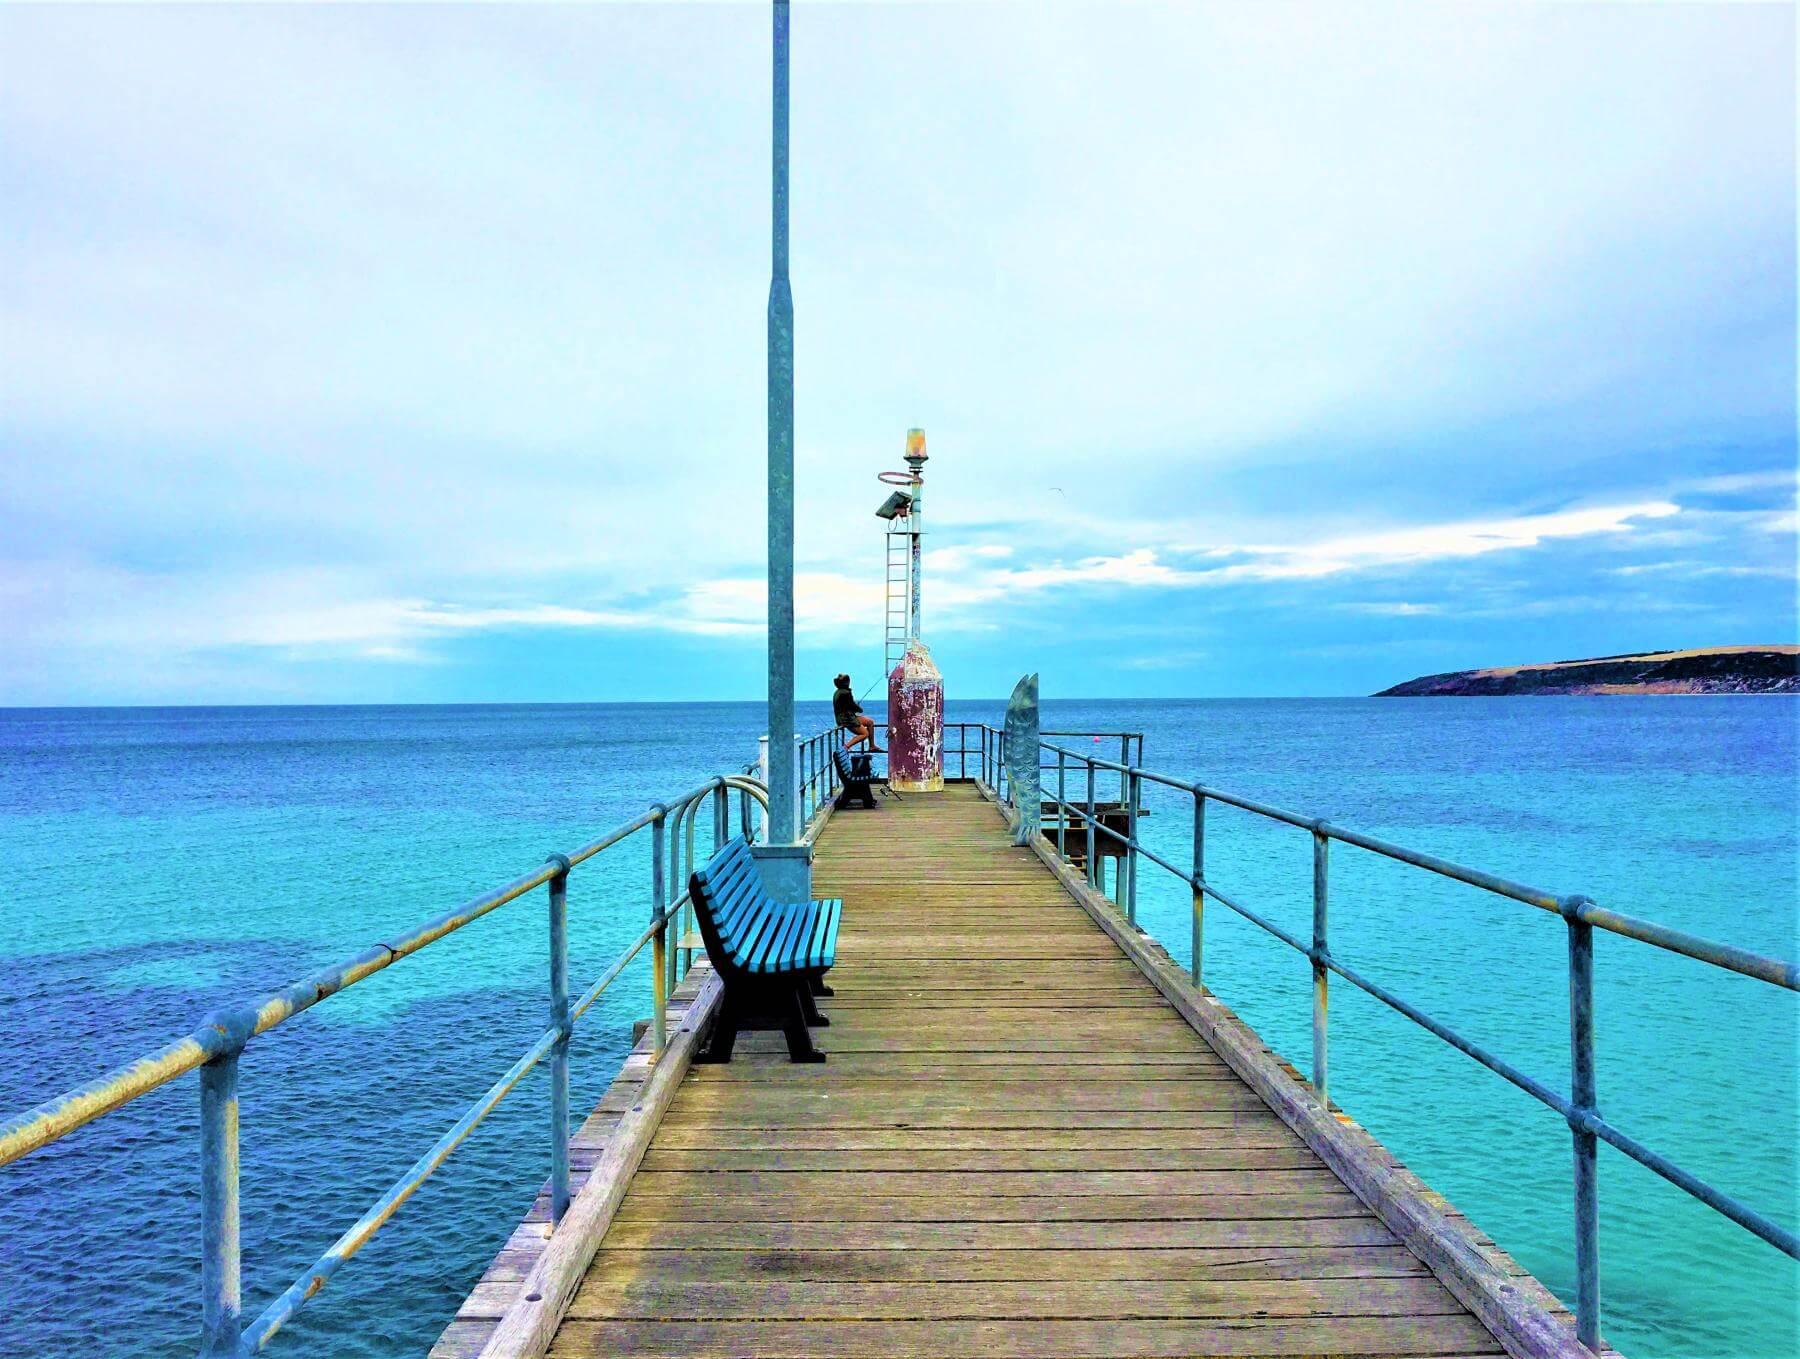 Bucht auf Känguru Insel inAustralien